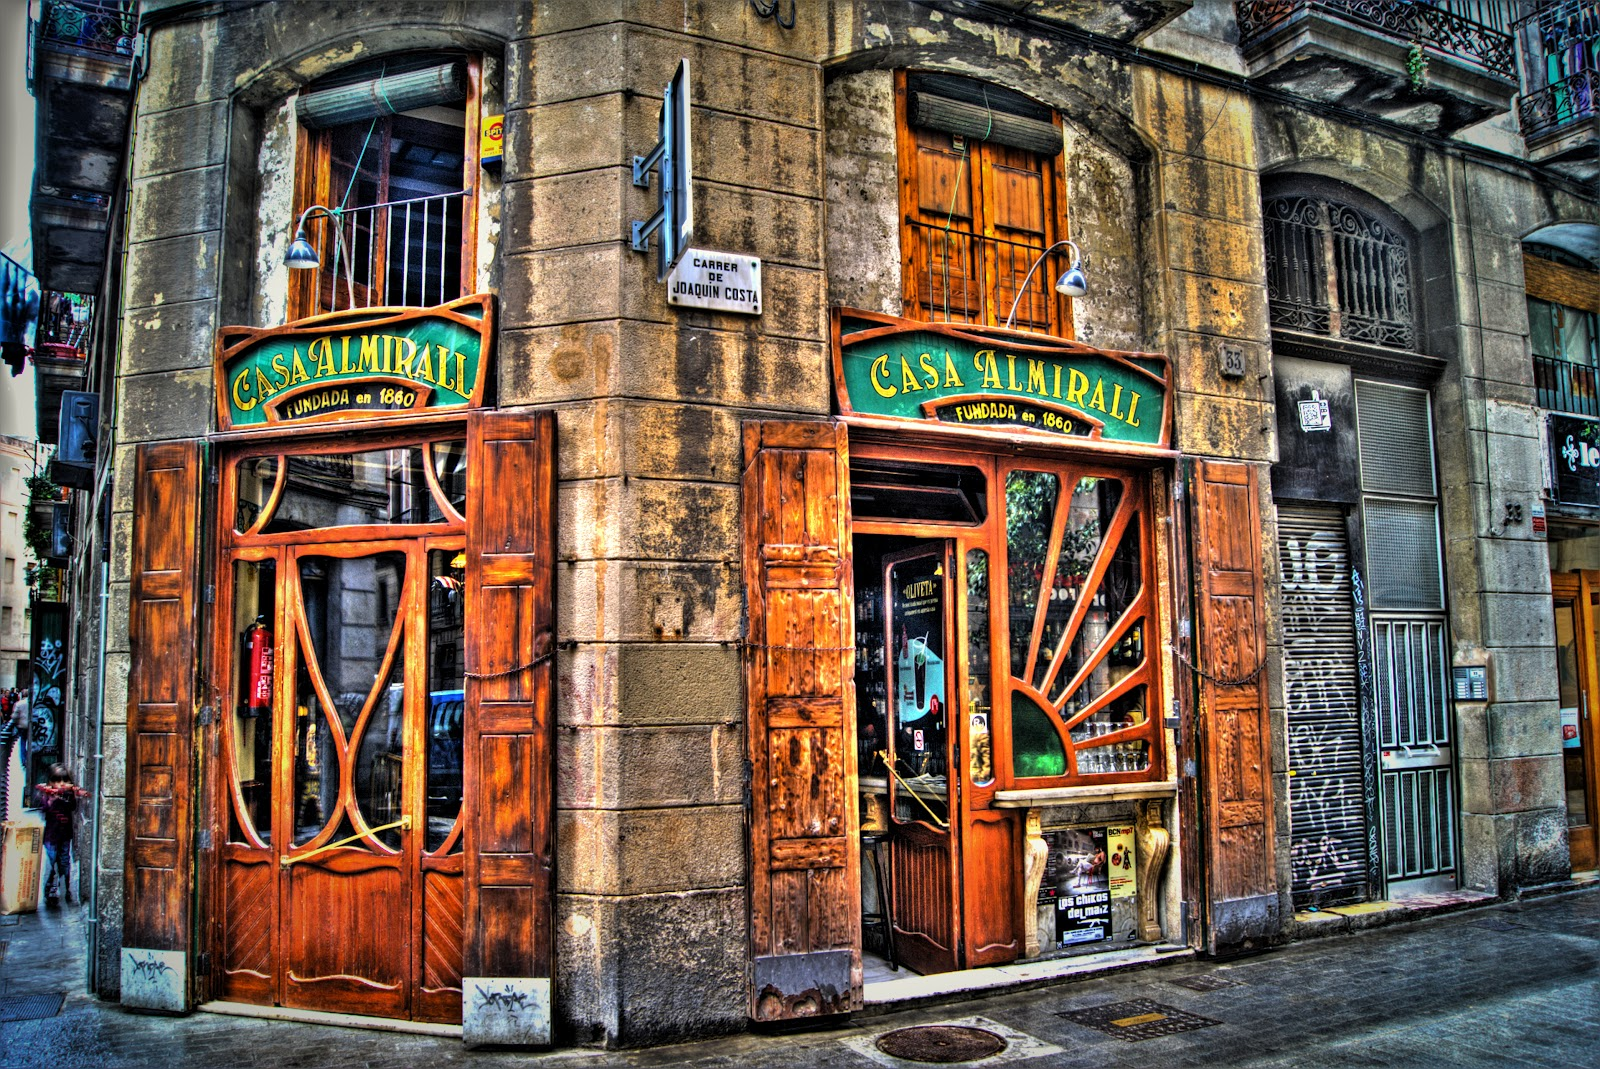 Casa almirall el bar modernista del raval in and out - Casas modernistas barcelona ...